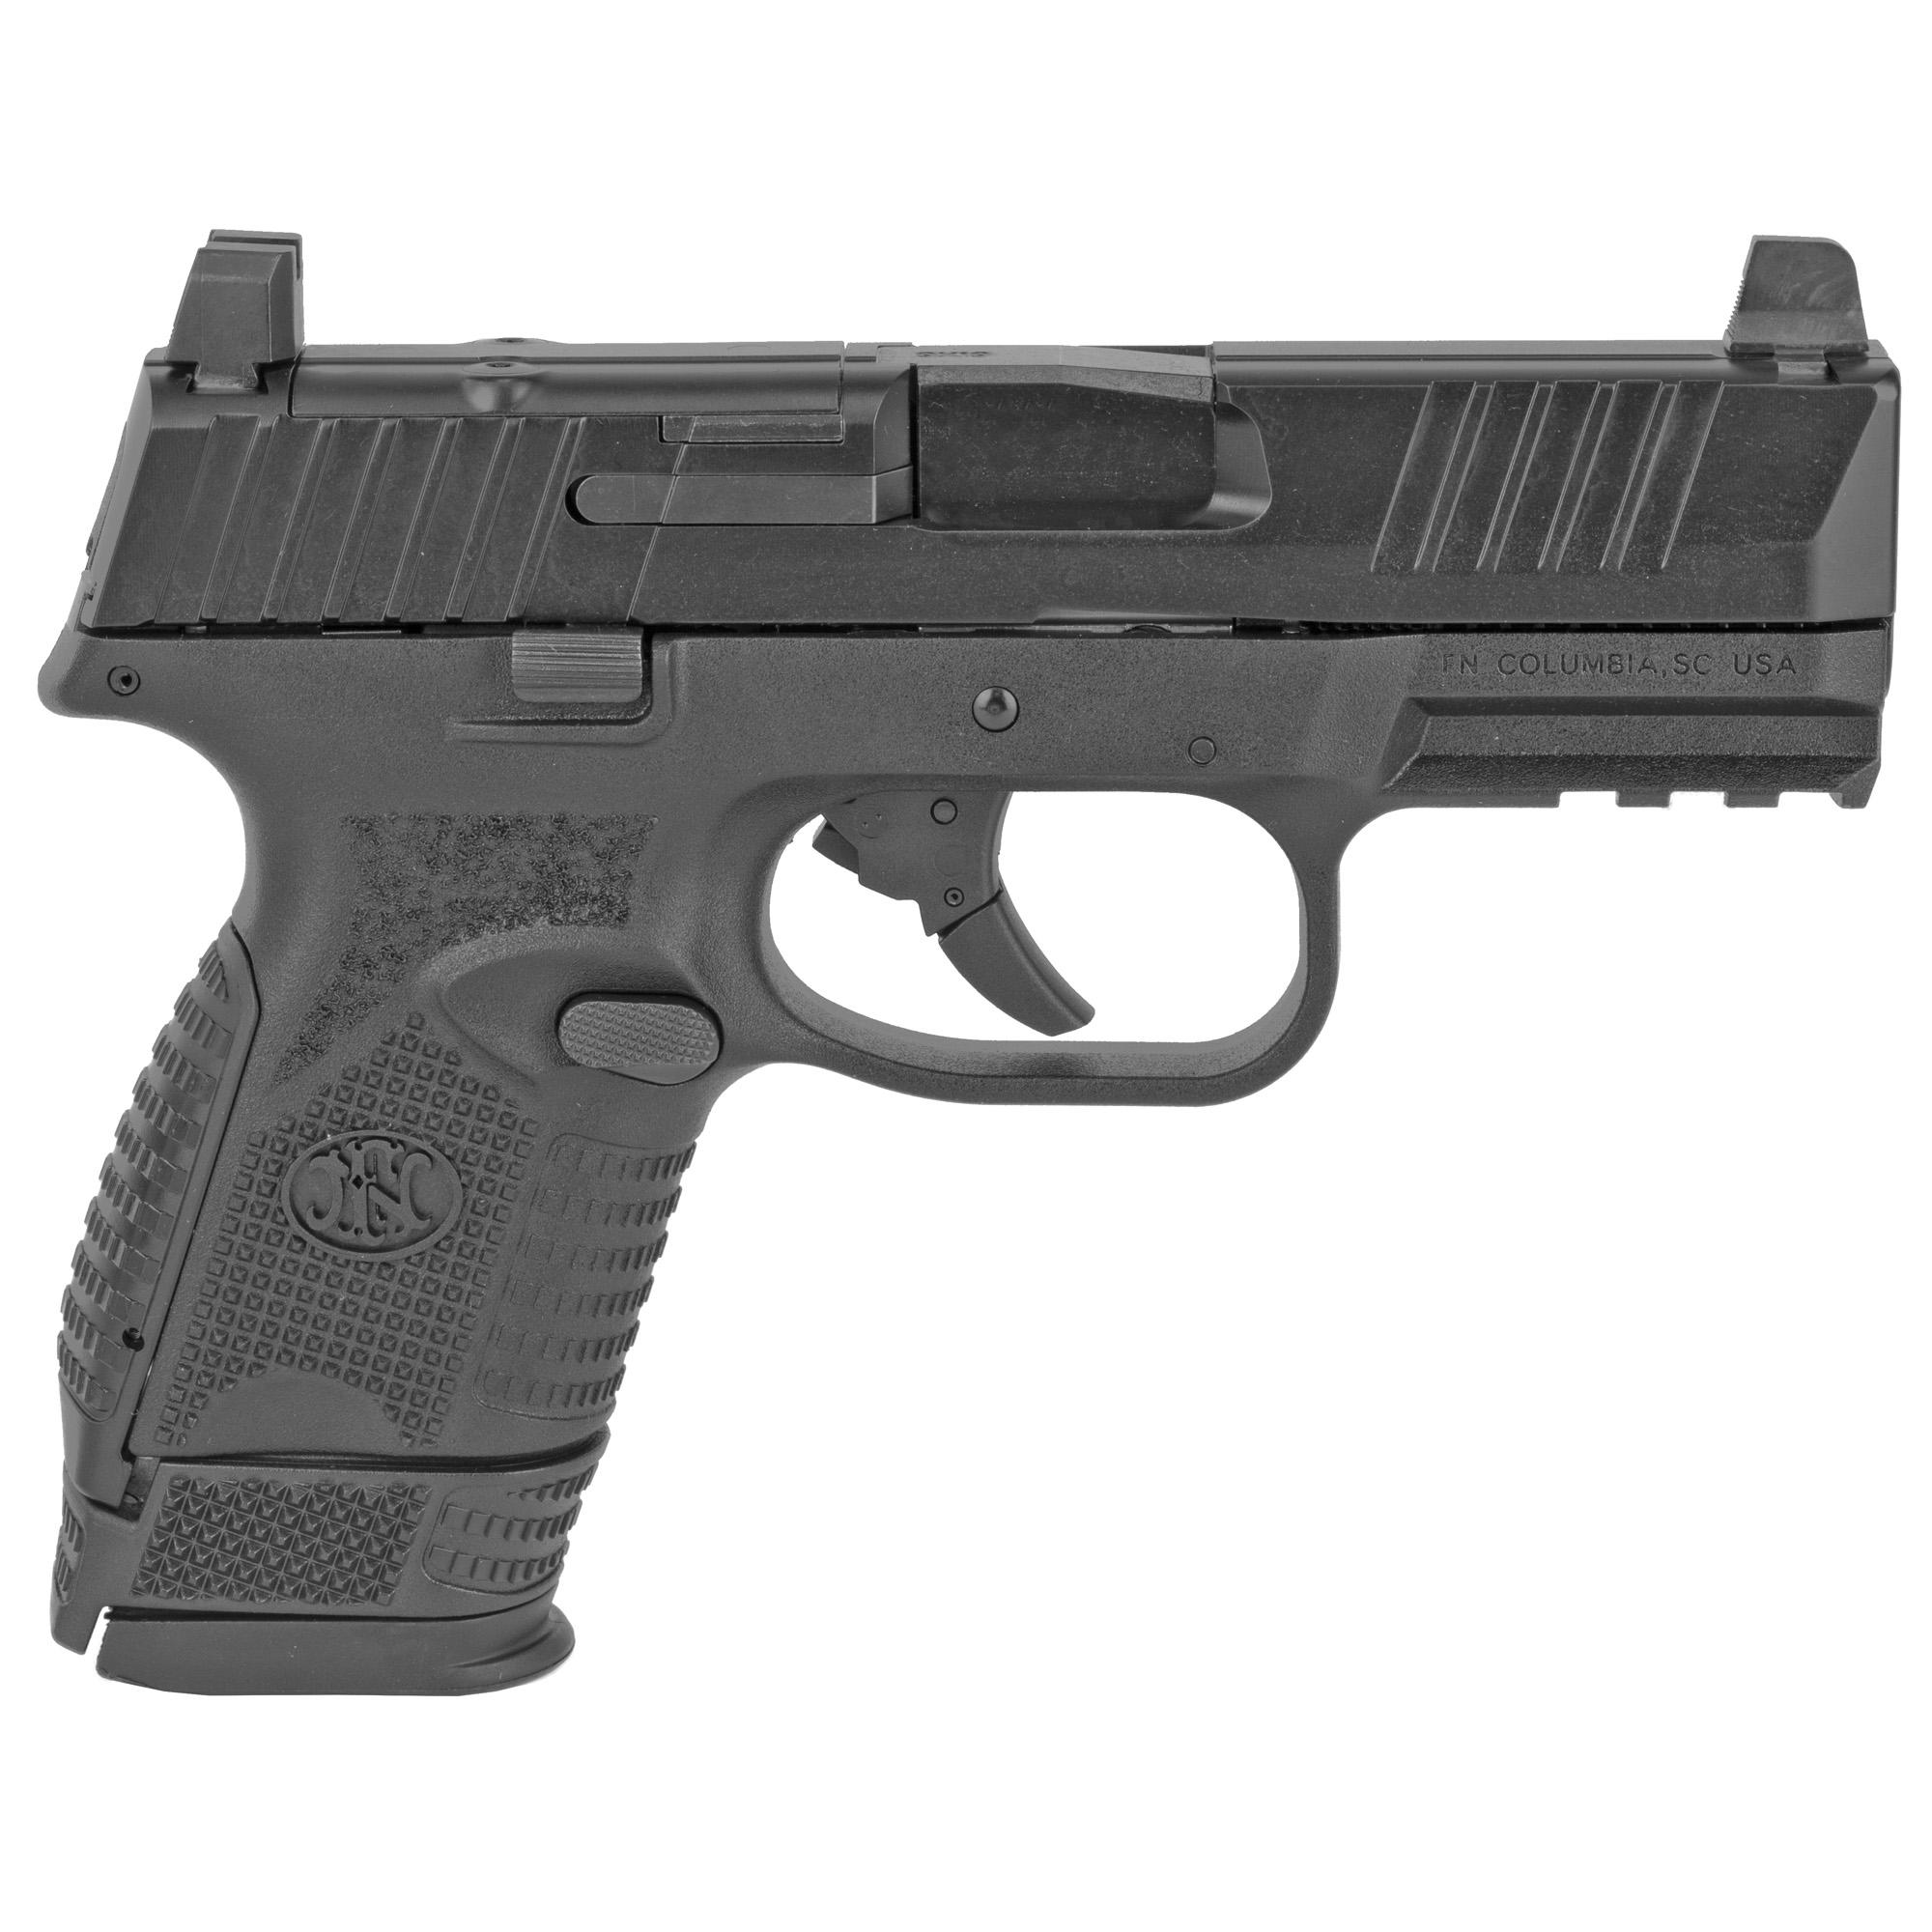 FN FN 509 Compact MRD 9mm